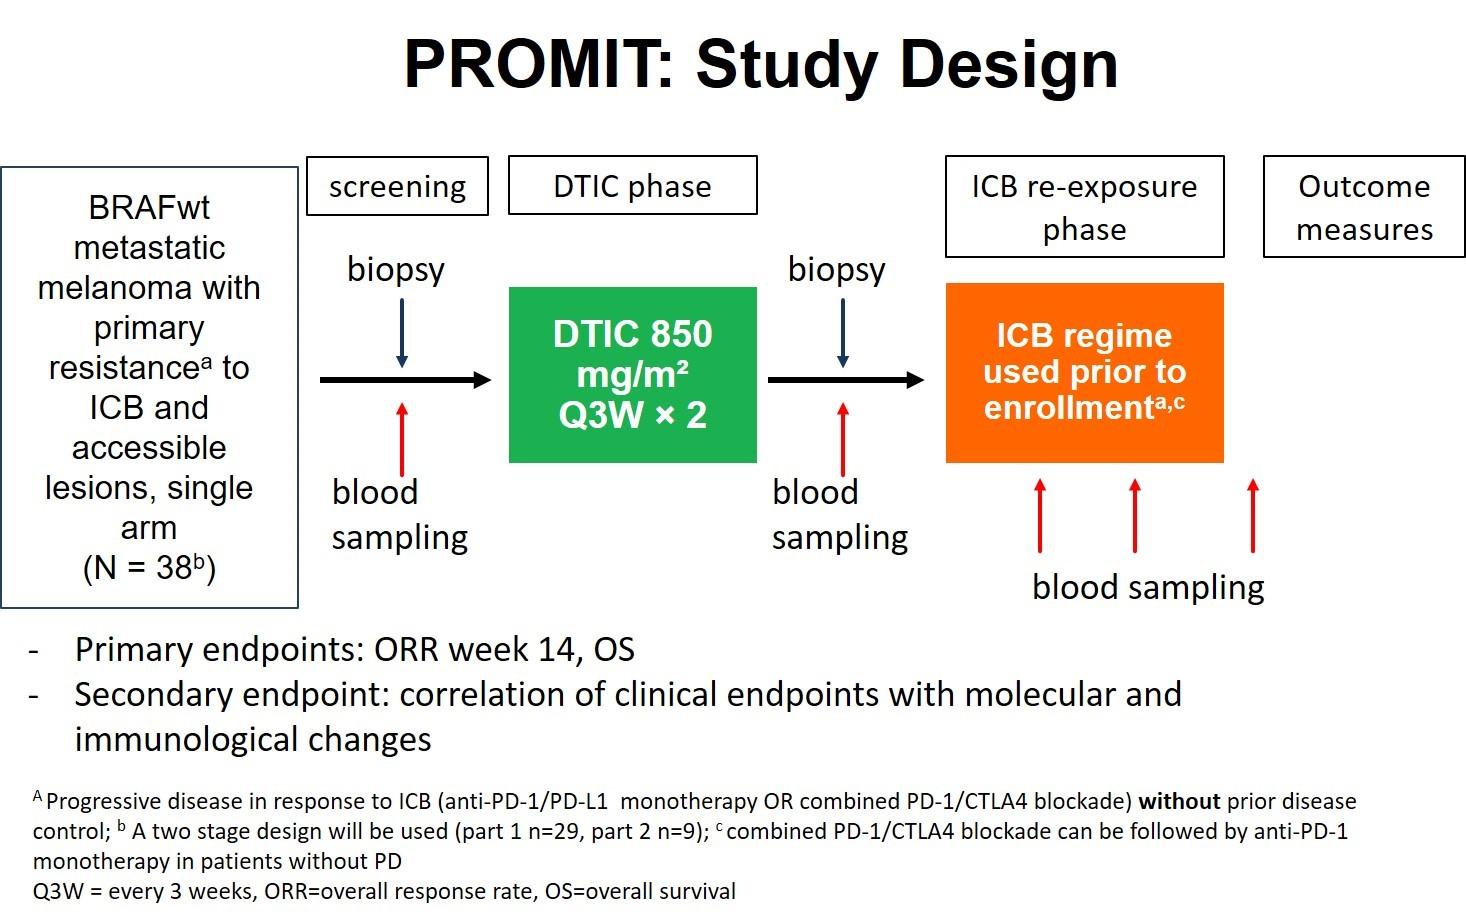 PROMIT Study Design